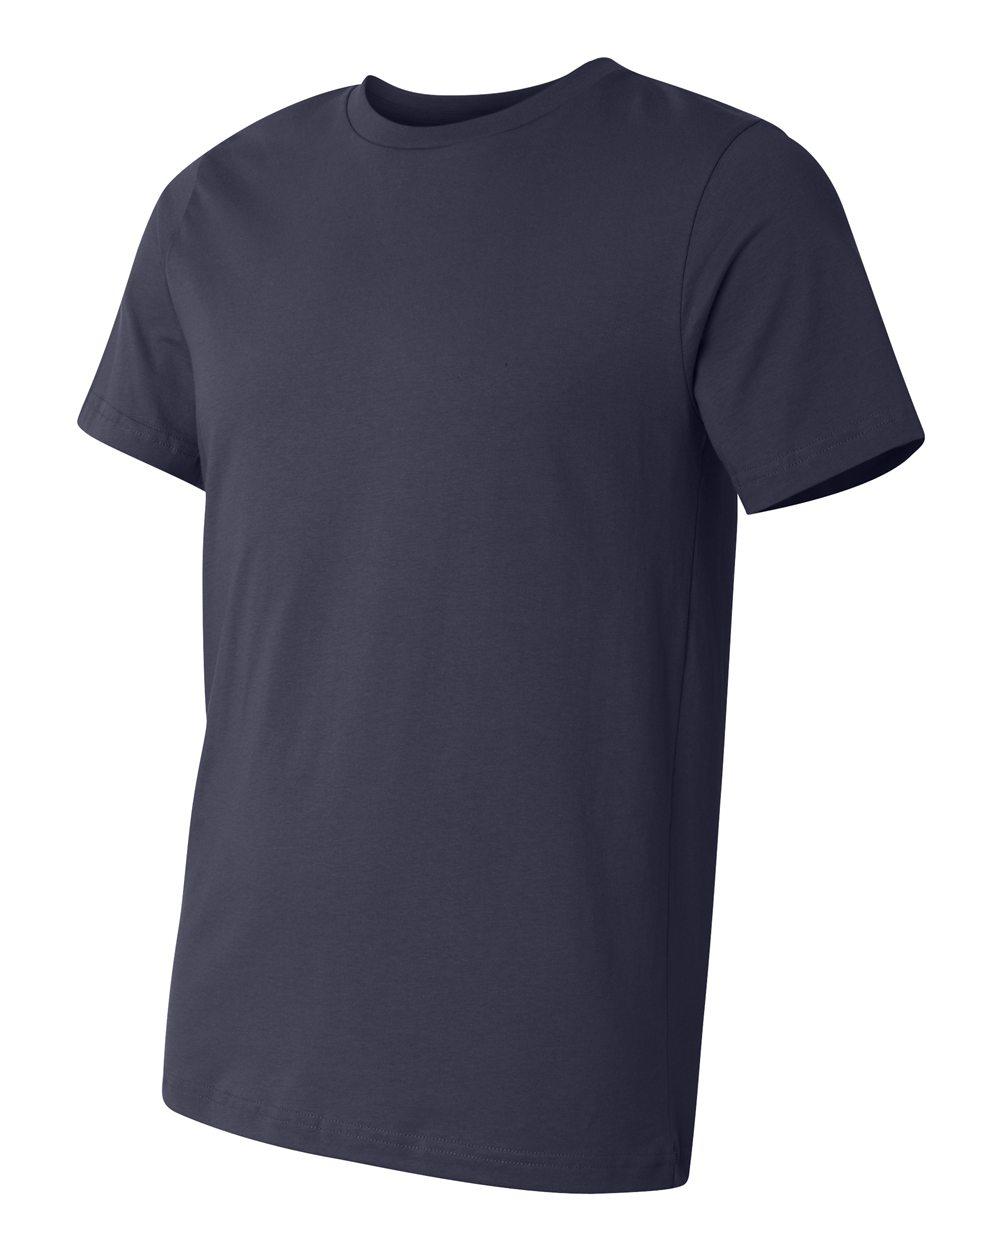 Bella-Canvas-Unisex-Made-in-USA-Jersey-Short-Sleeve-T-Shirt-3001U-XS-3XL thumbnail 6